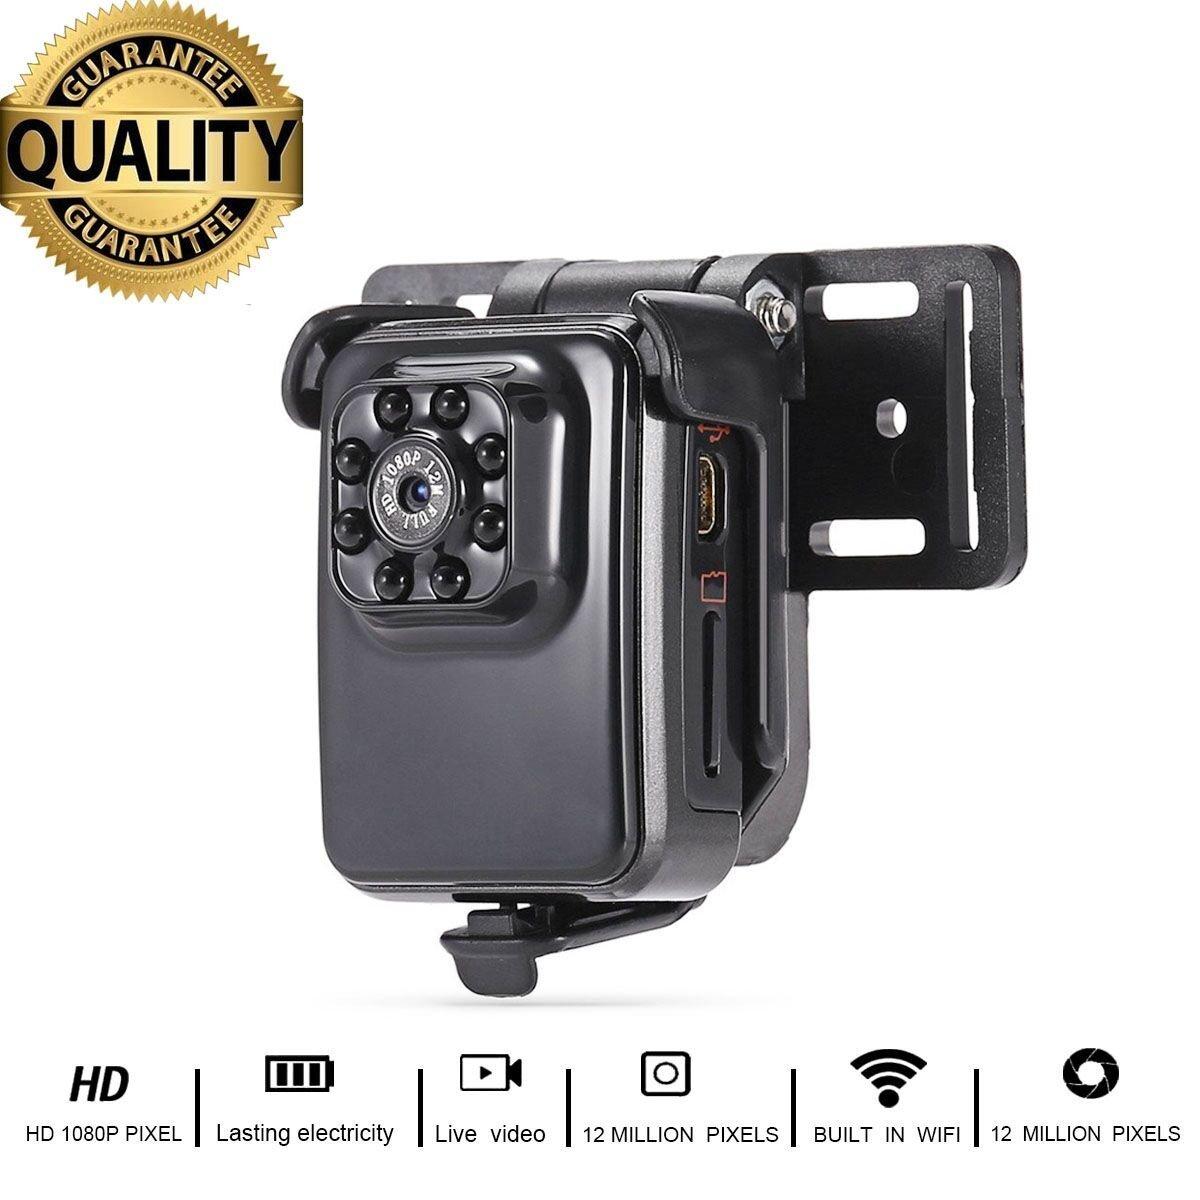 Mini Caméra R3 WIFi HD Caméscope avec vision nocturne 1080p Sports Mini DV Video Recorder HankerMall